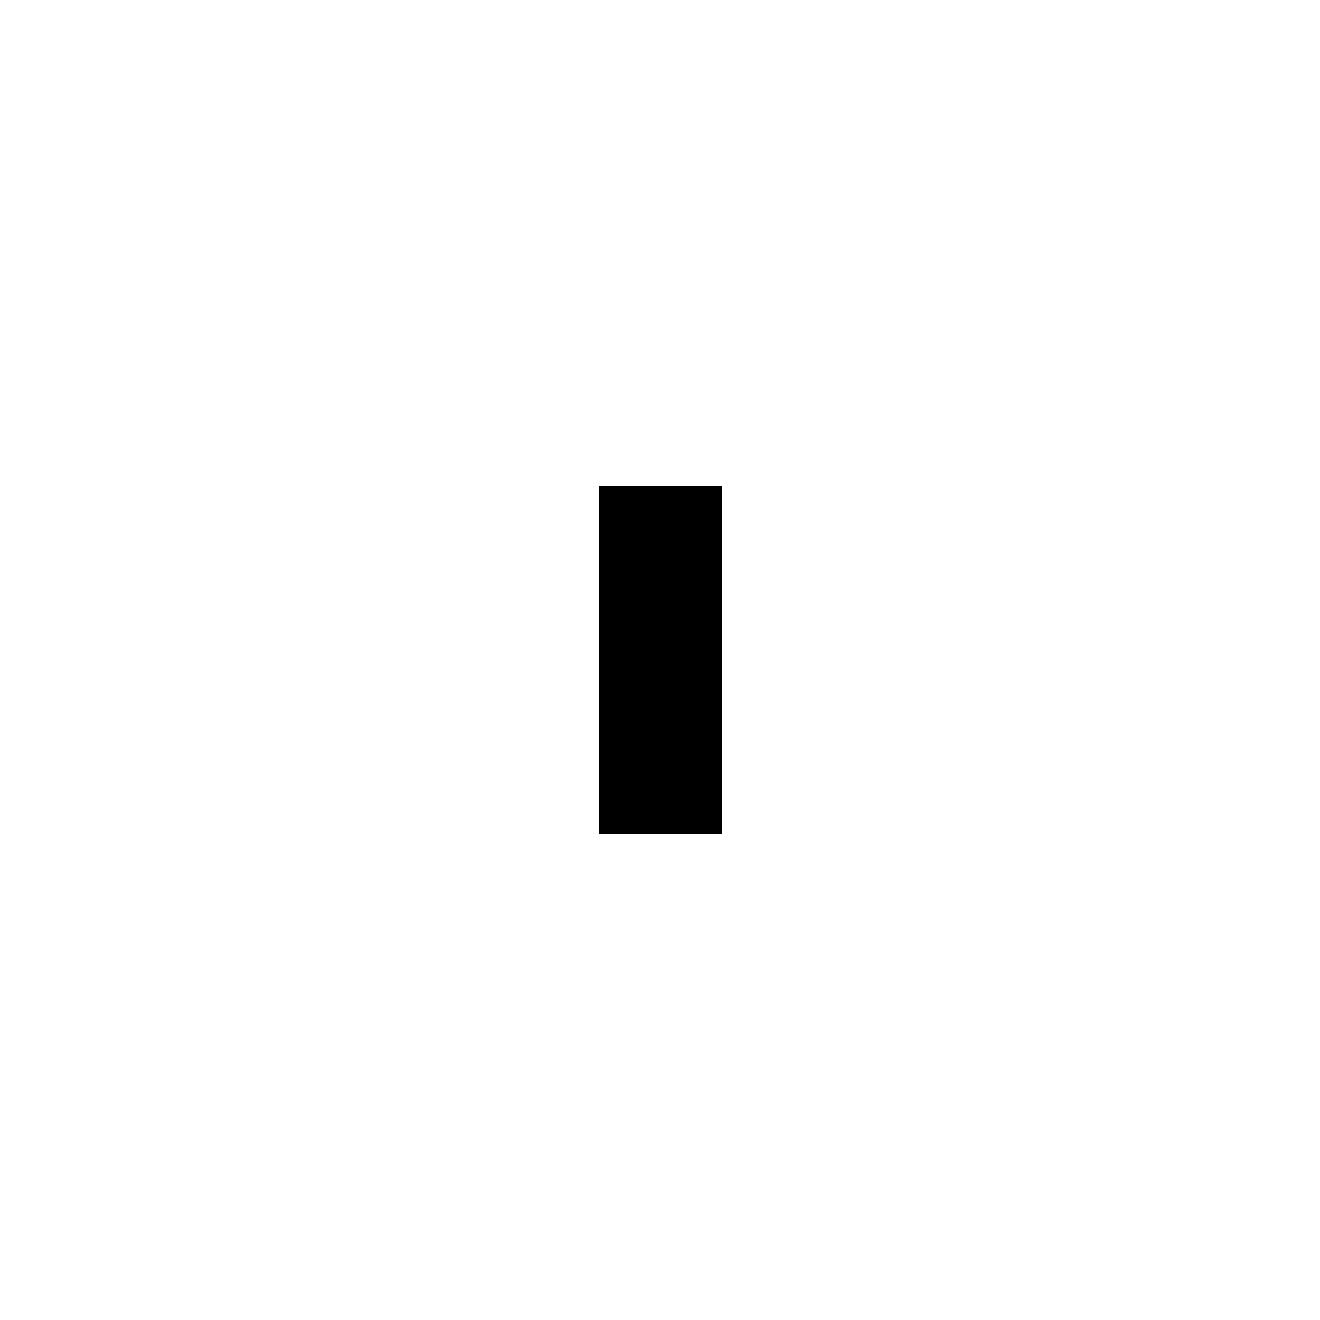 logo-1302